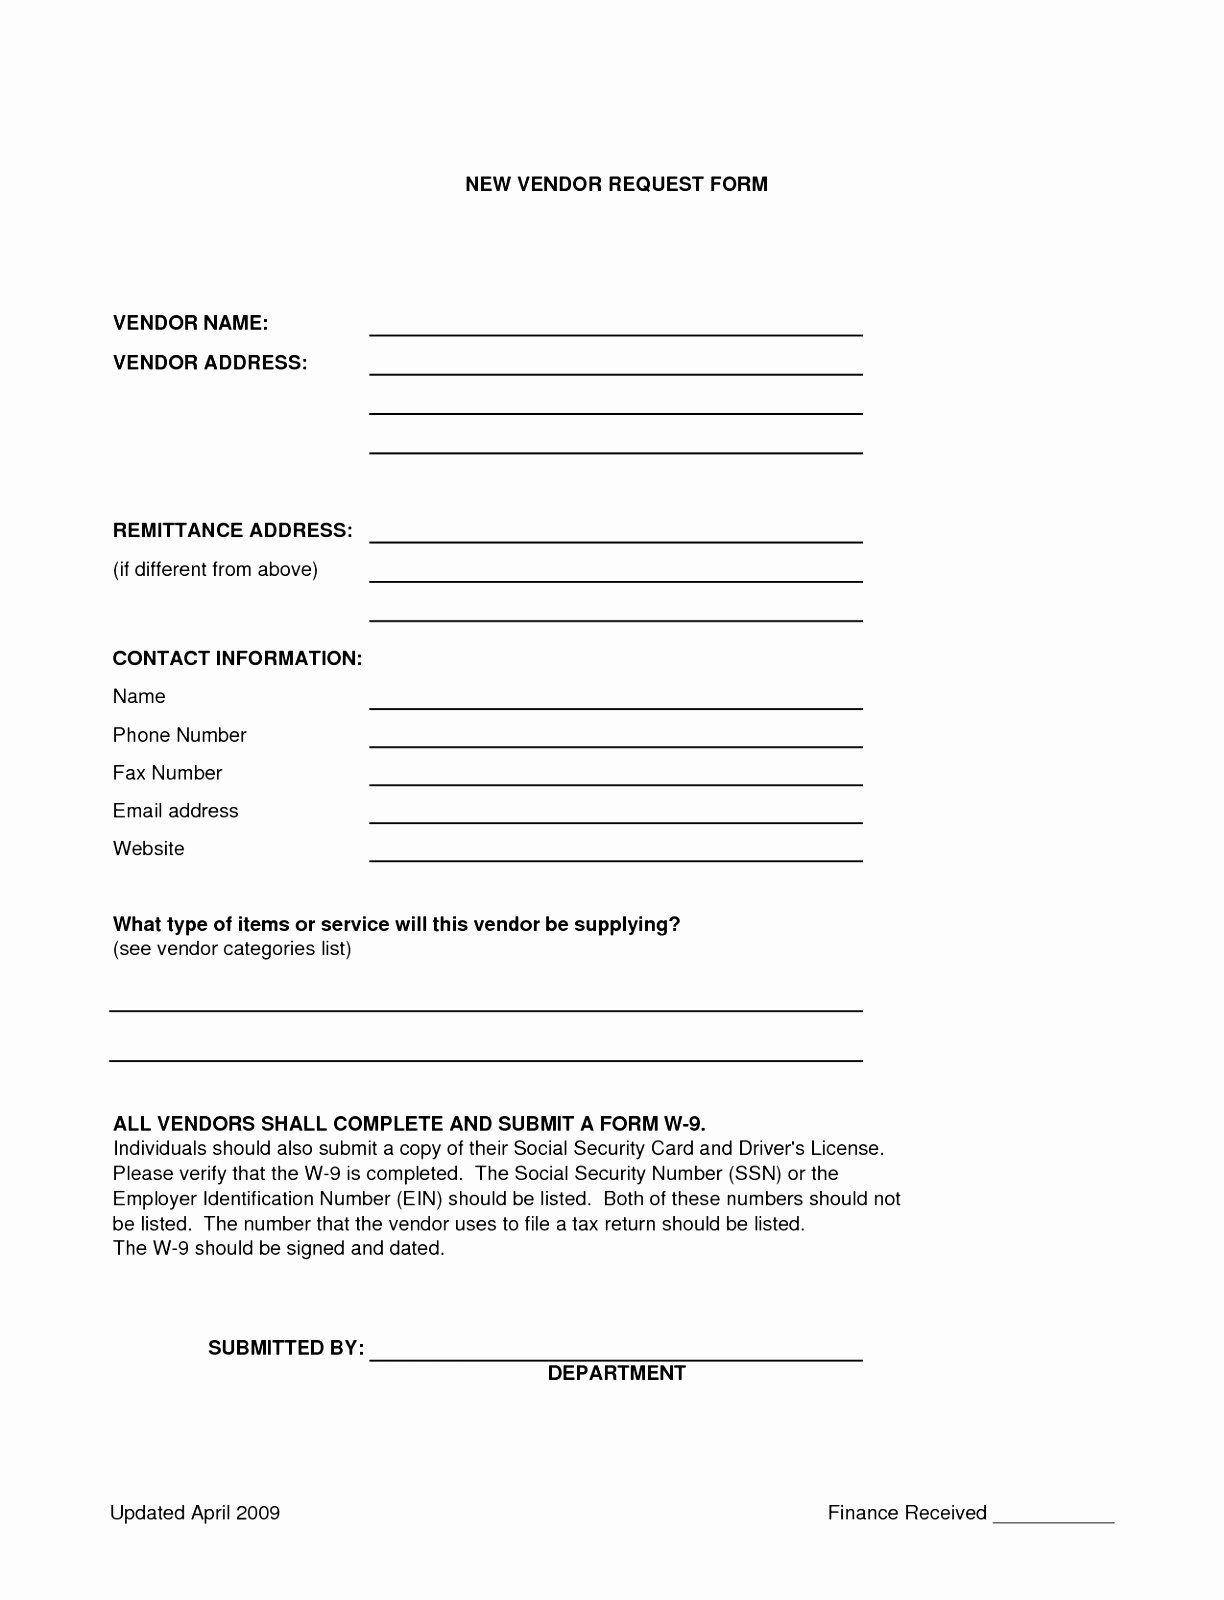 Vendor Information form Template Elegant 10 New Vendor form Template Yruat